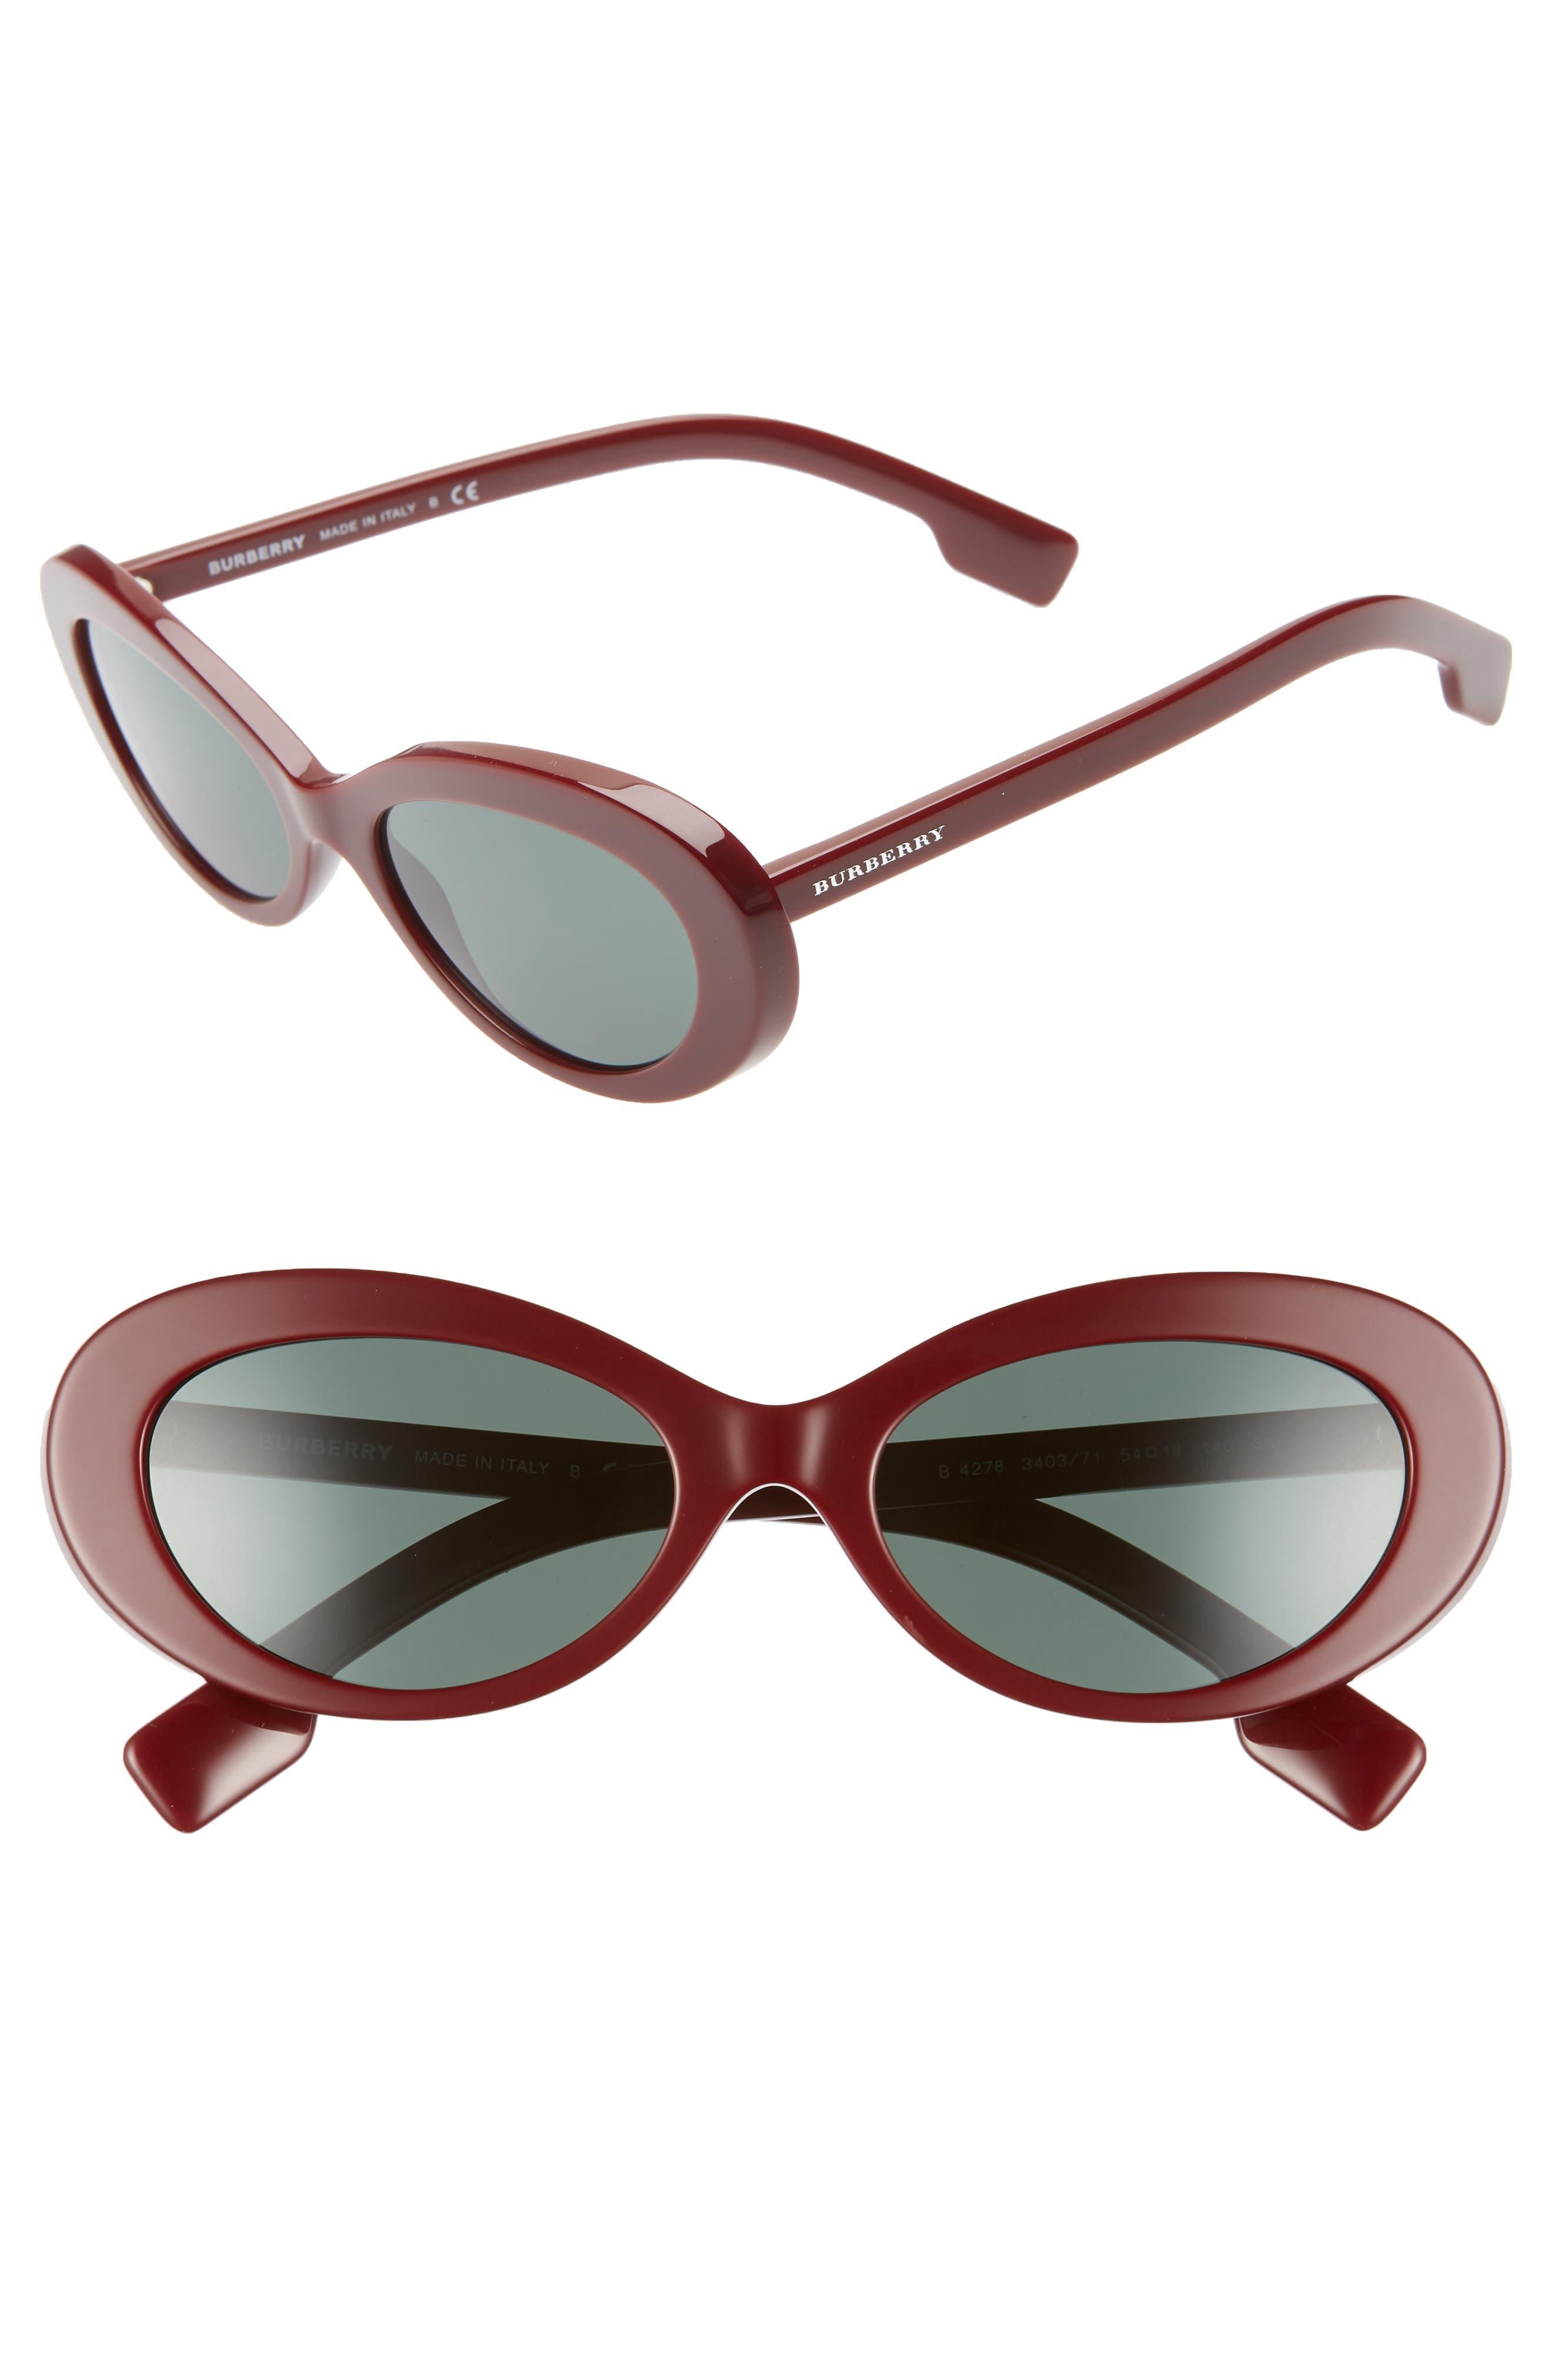 54mm Oval Sunglasses,                             Main thumbnail 1, color,                             BORDEAUX SOLID